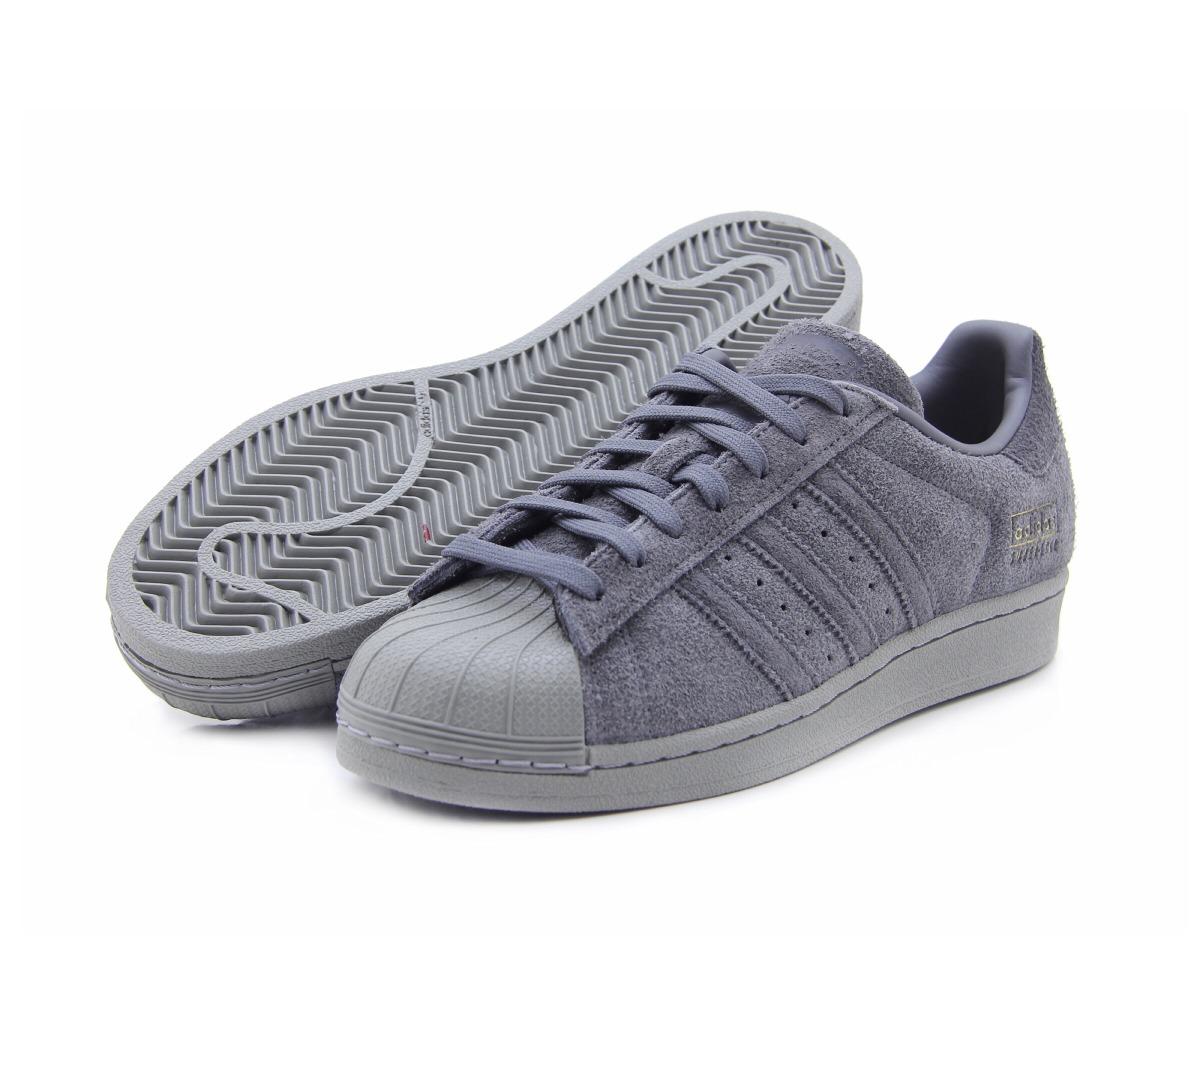 Originals Bz0216 Tenis Hombre Superstar Dancing adidas nwP8kO0